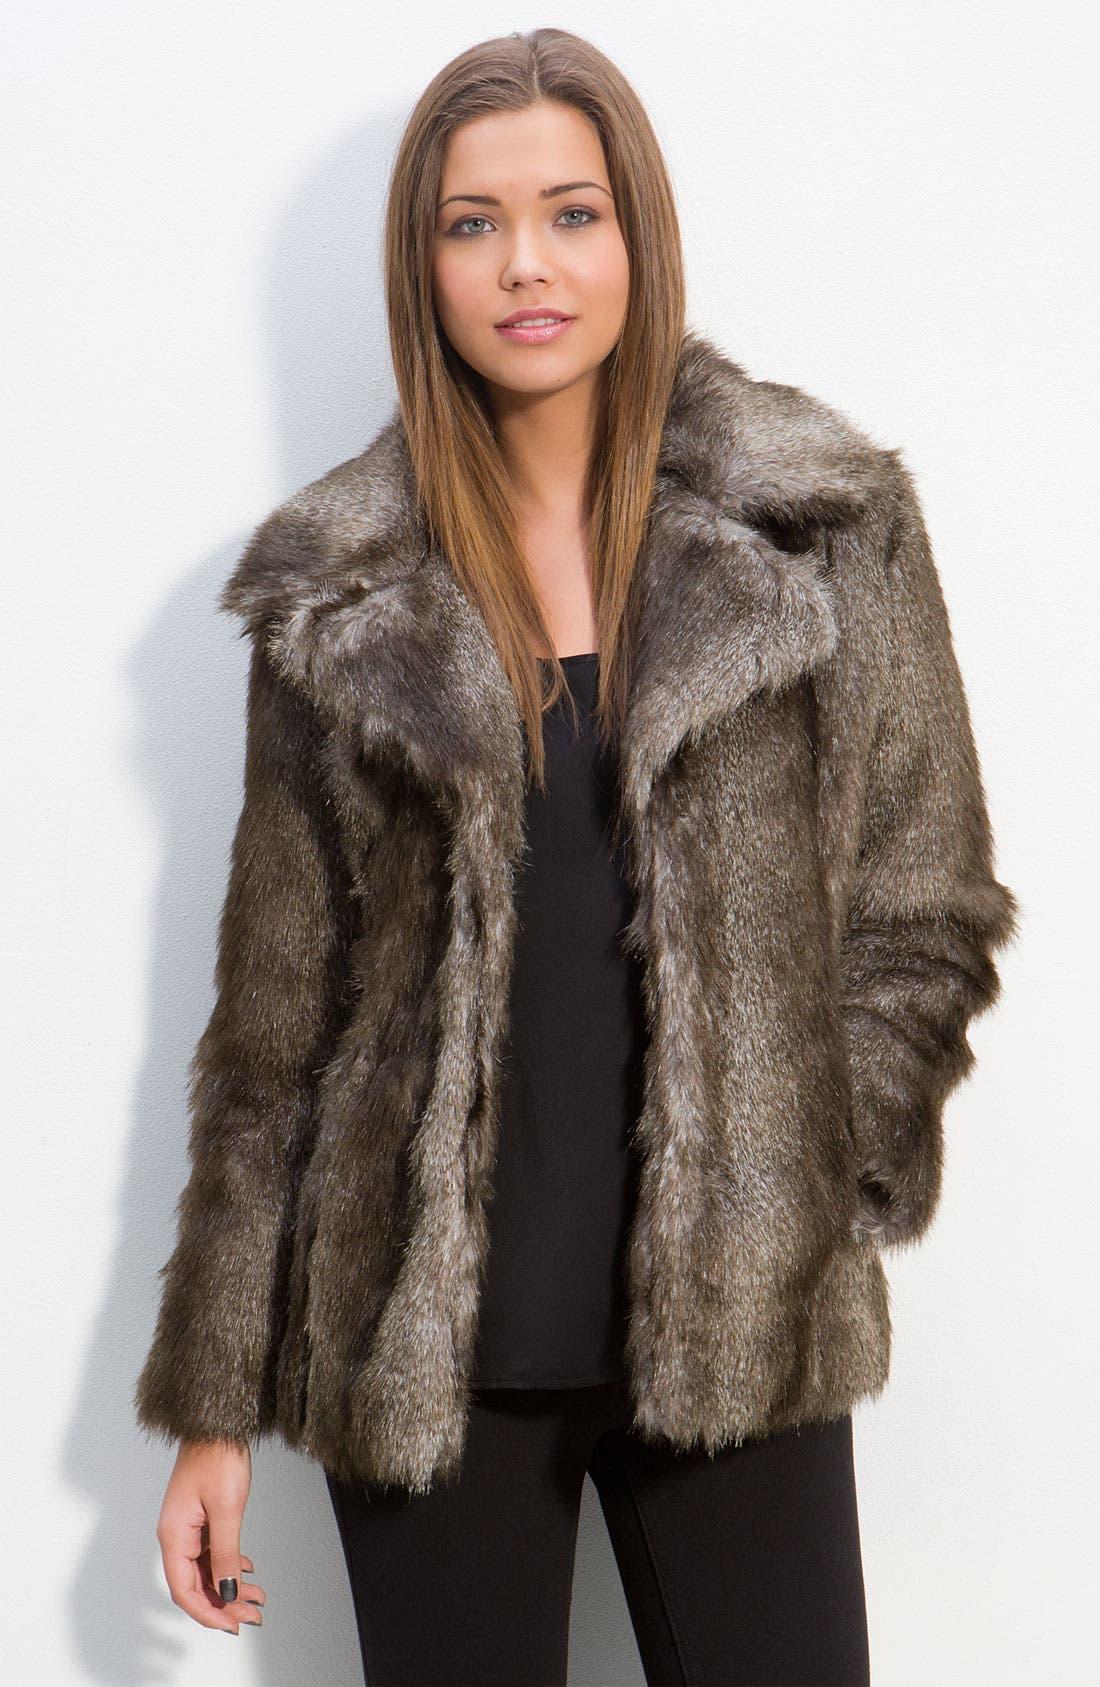 Alternate Image 1 Selected - Thread & Supply Faux Fur Jacket (Juniors)